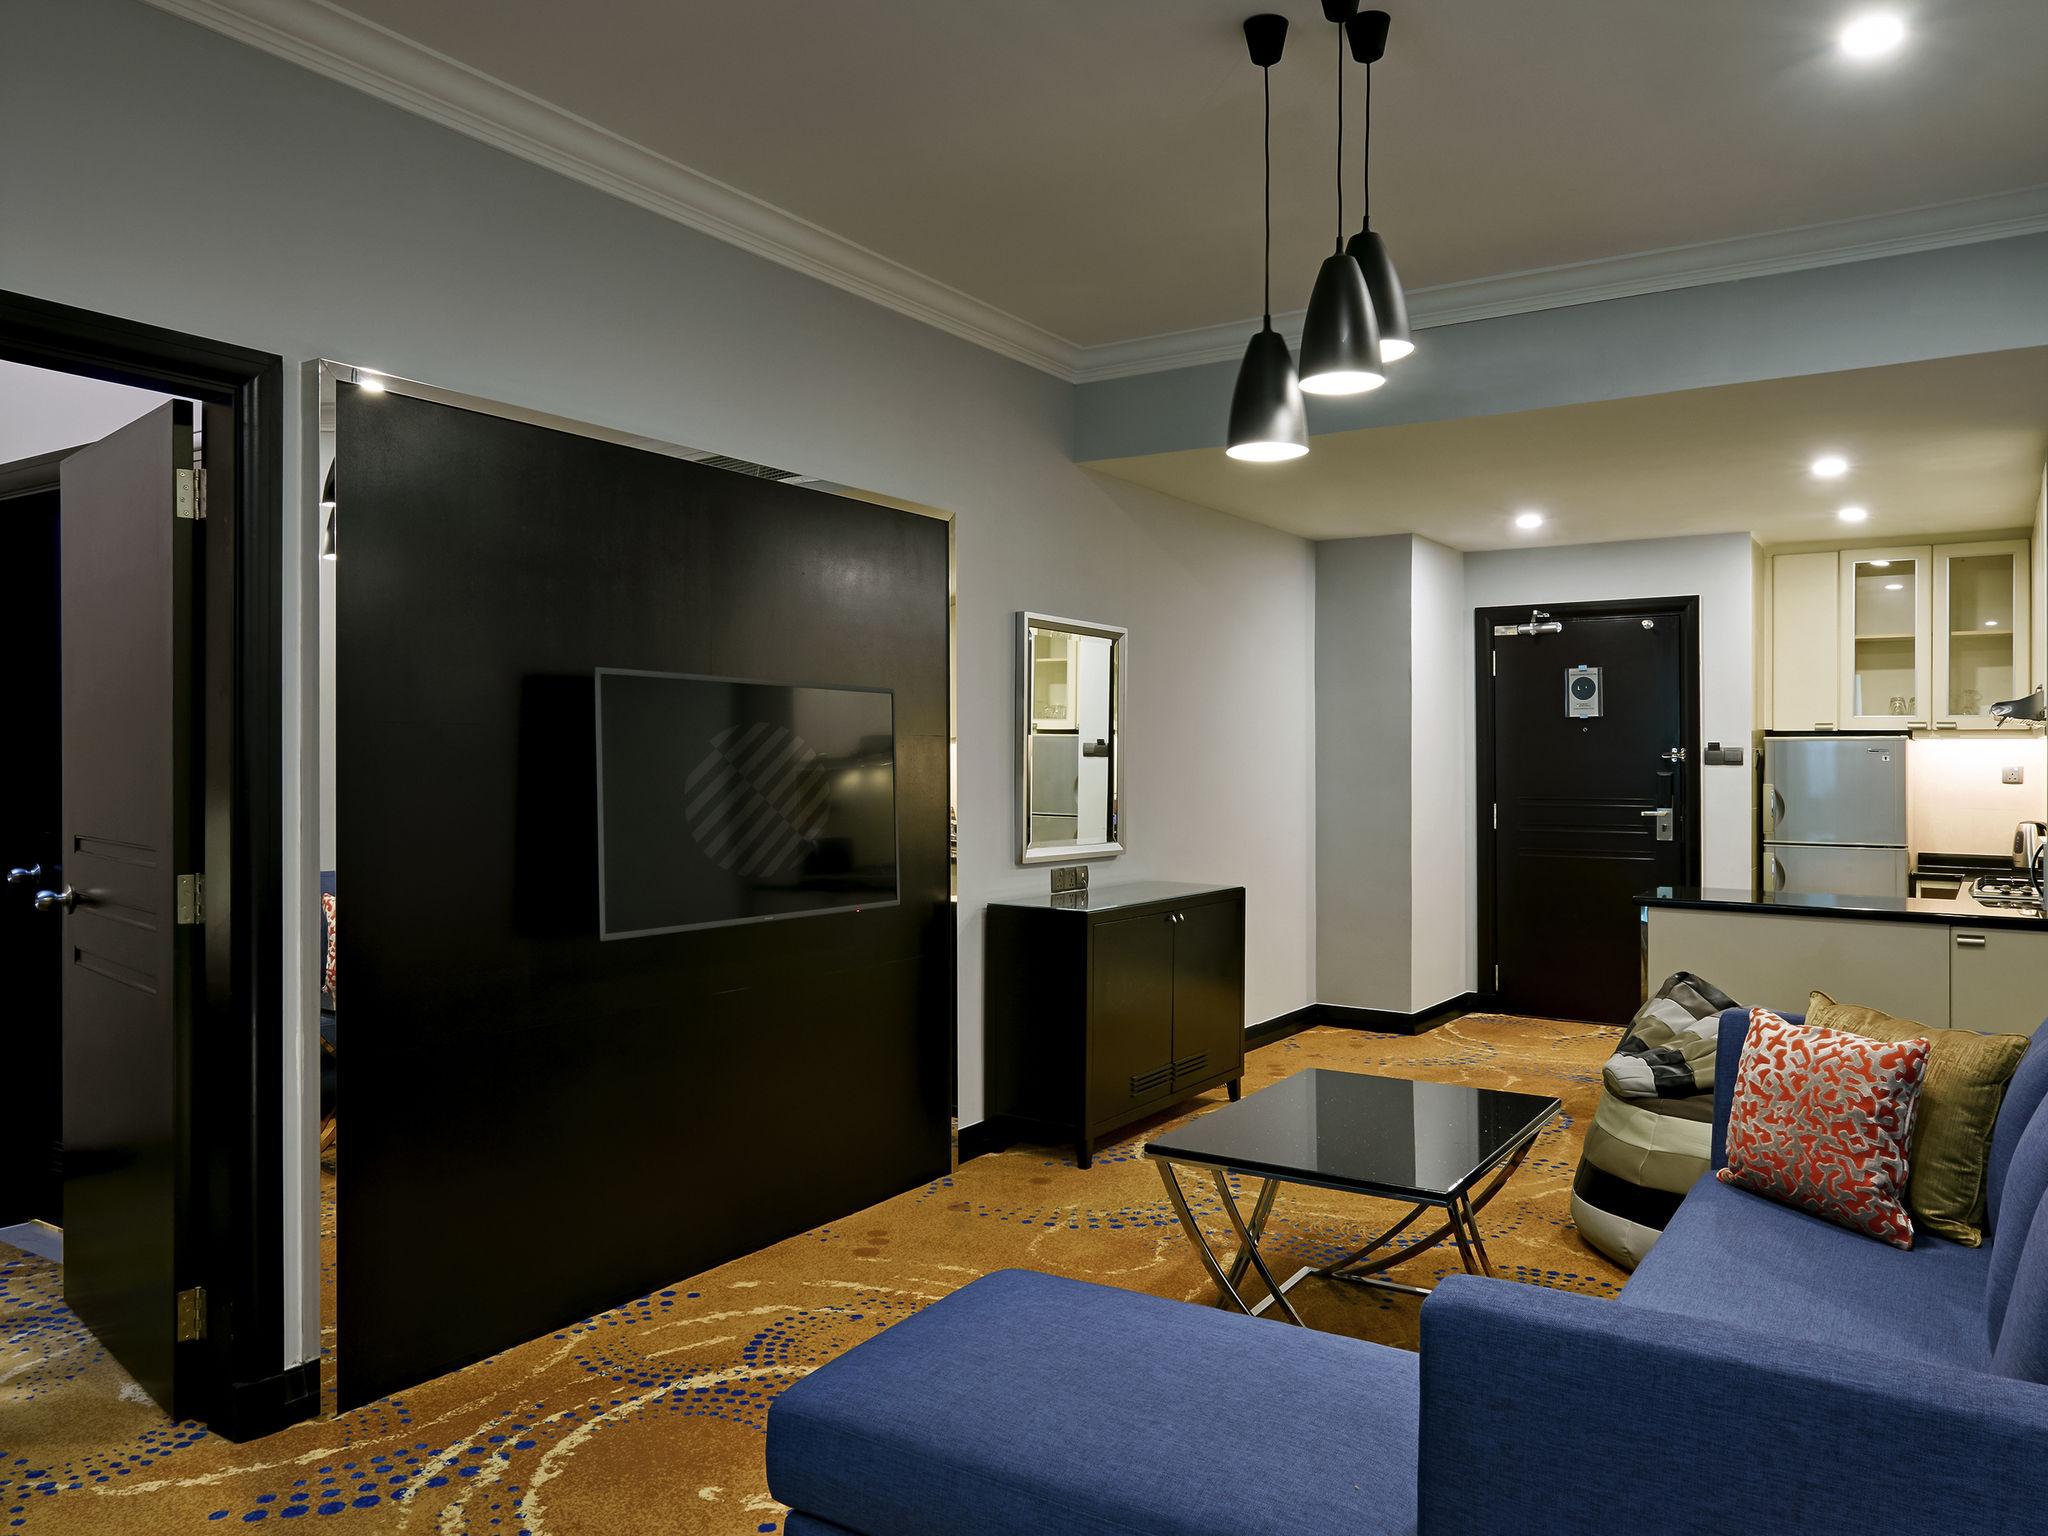 Pullman Klcc Hotel And Residences Kuala Lumpur